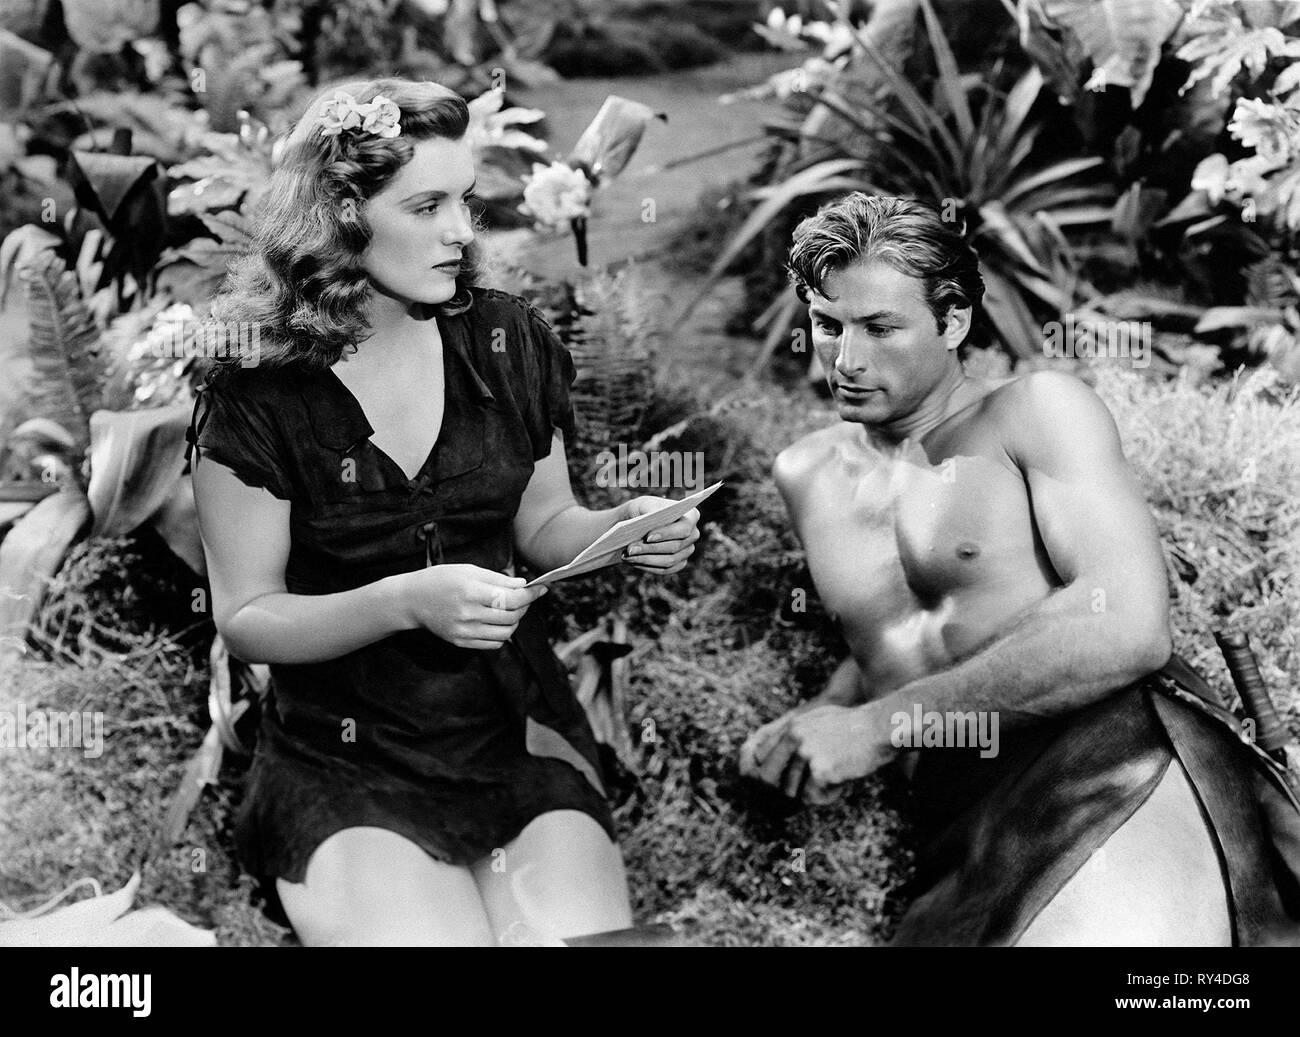 JOYCE,BARKER, TARZAN'S MAGIC FOUNTAIN, 1949 - Stock Image